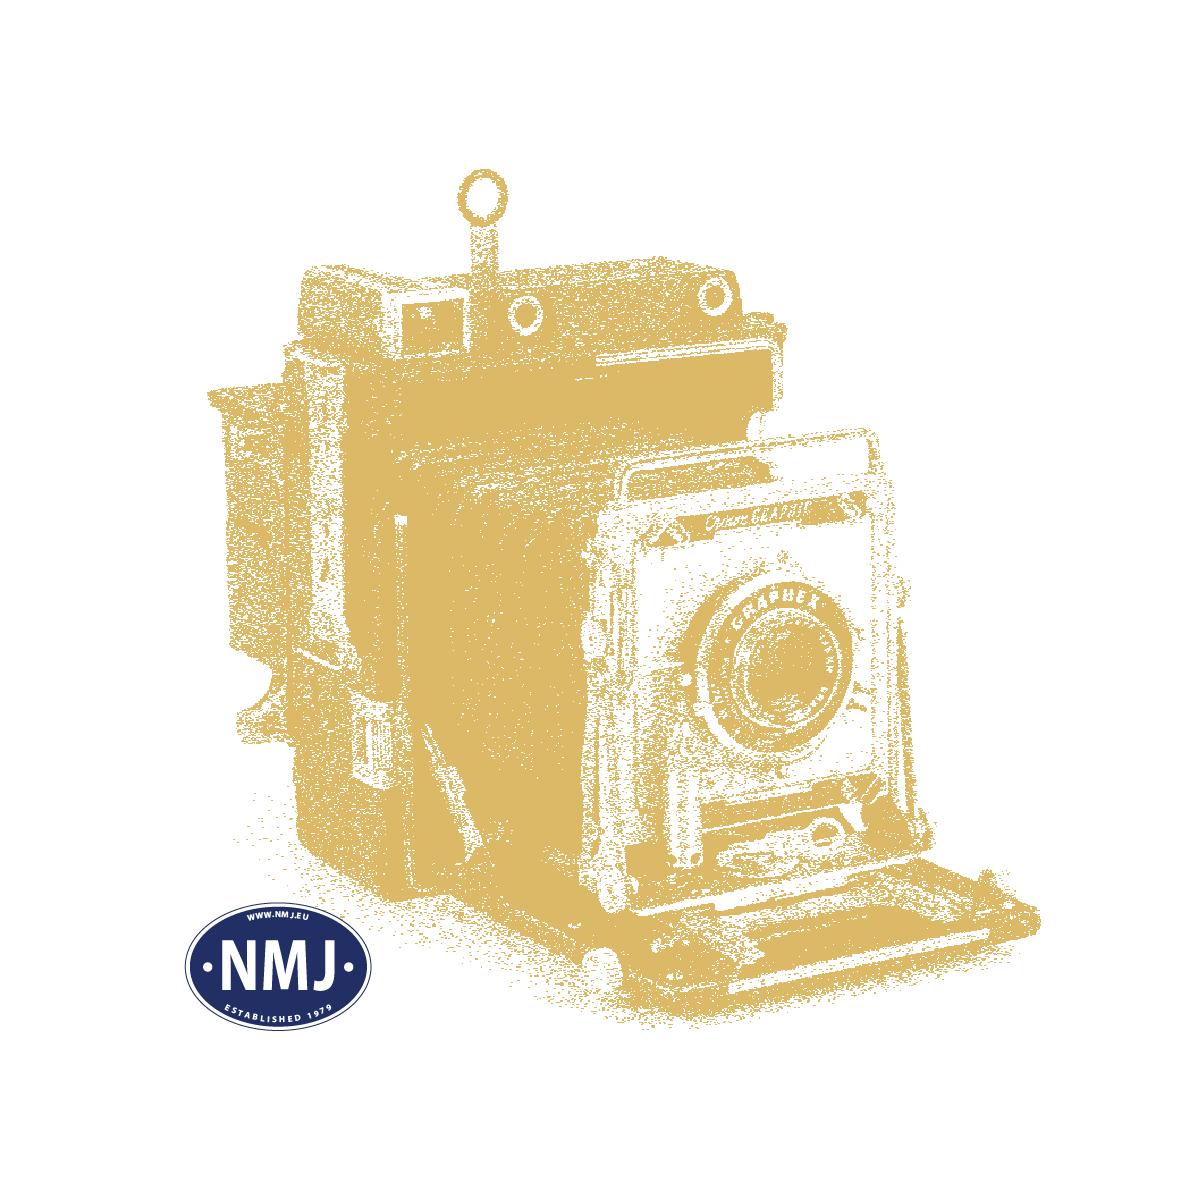 NMJT205.003 - NMJ Topline SJ Bo5 4931, 2 kl. Personvogn, rund SJ logo, original versjon